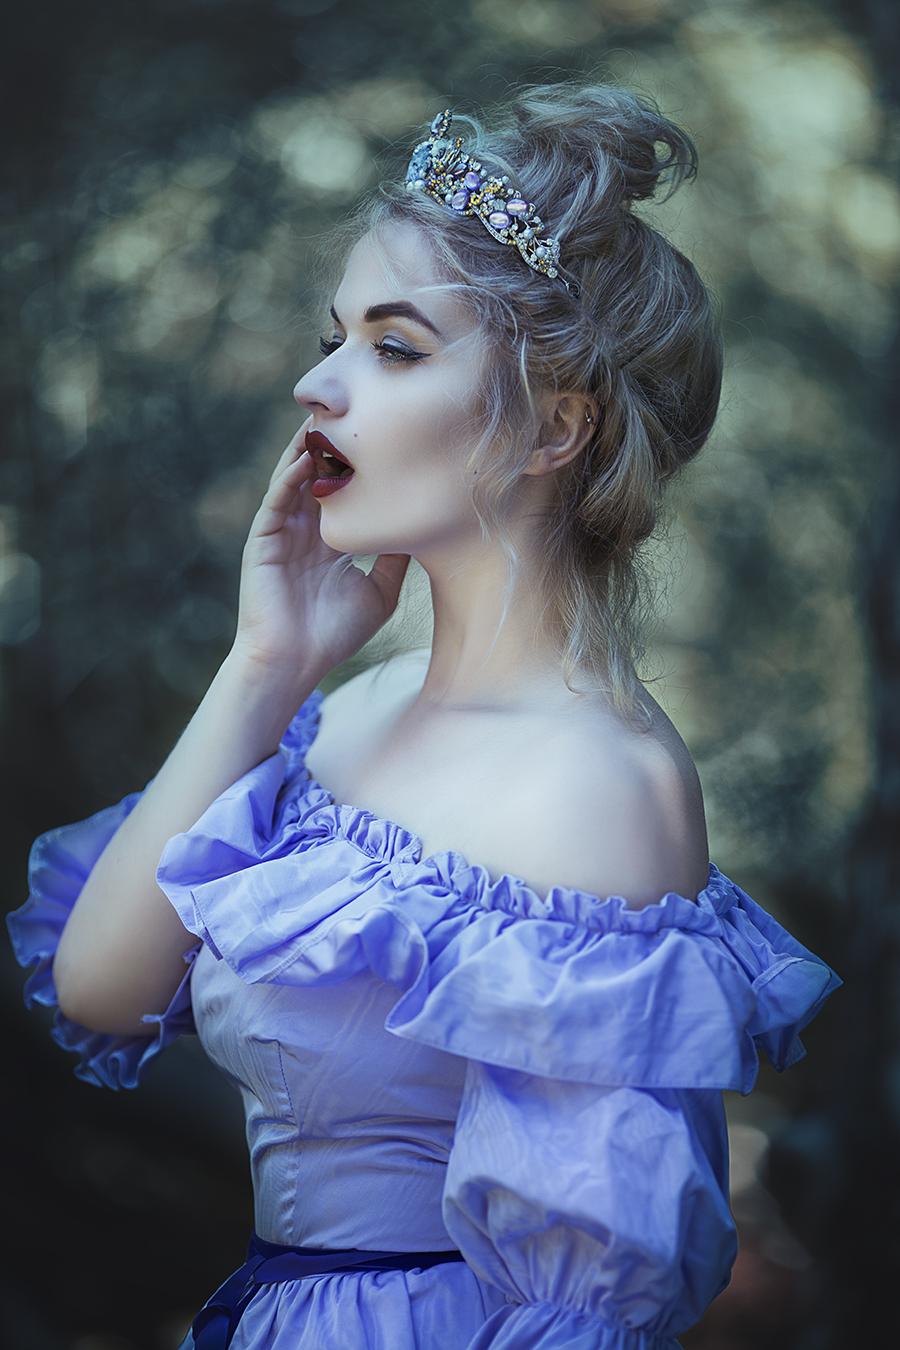 Carribean Blue / Photography by Anjelica Hyde, Model Jessica Megan / Uploaded 1st November 2017 @ 03:17 PM